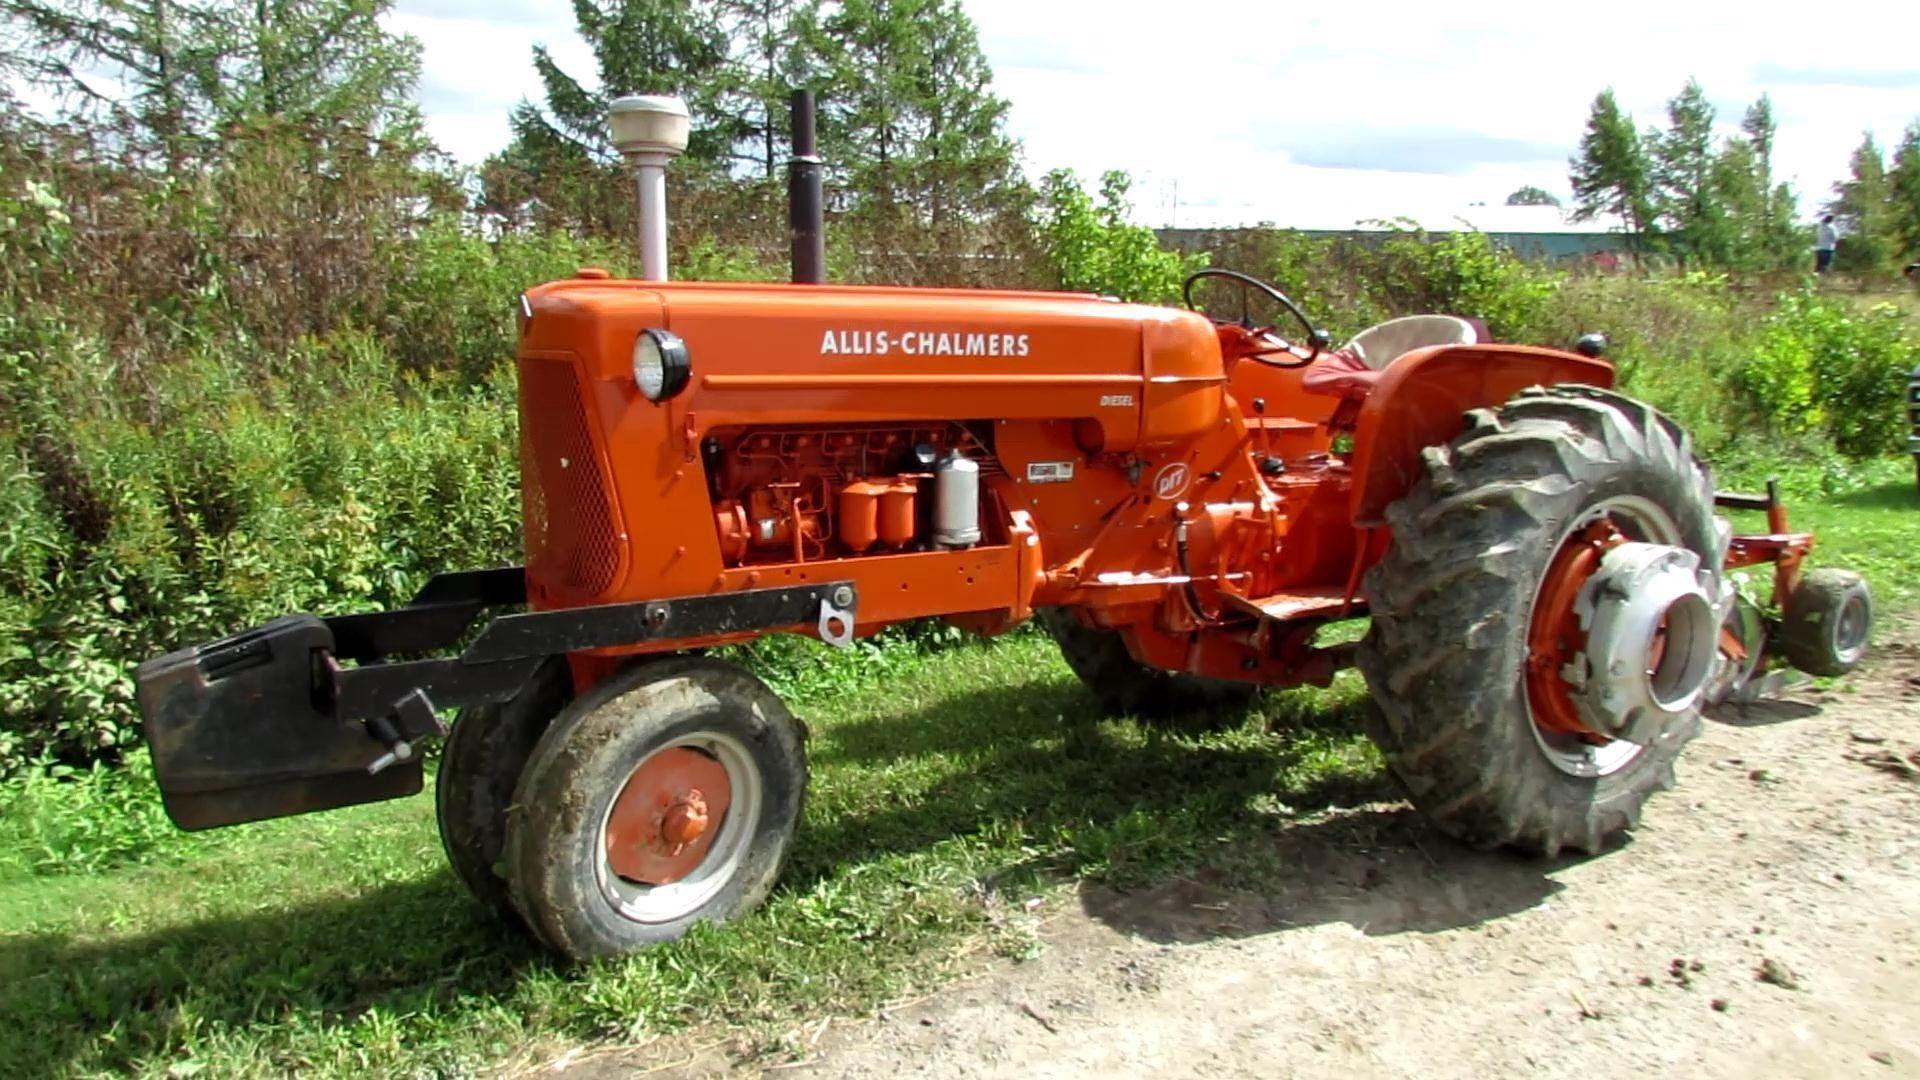 Vintage Allis Chalmers Tractors : Antique allis chalmers tractors maxresdefault g